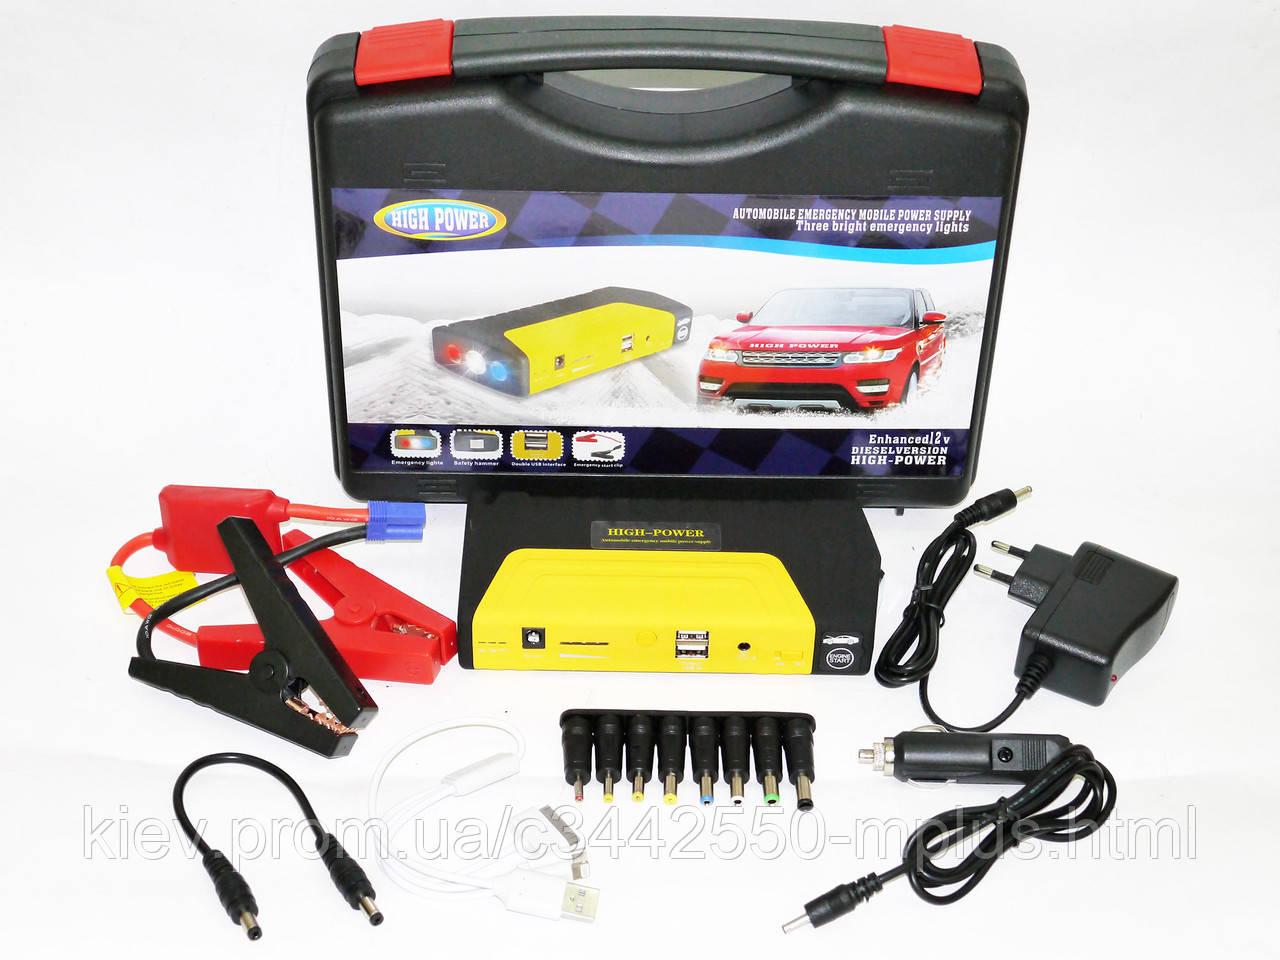 Car jump starter 16800mAh Повер банк зарядно пусковое устройство для машины 2хUSB+Фонарик